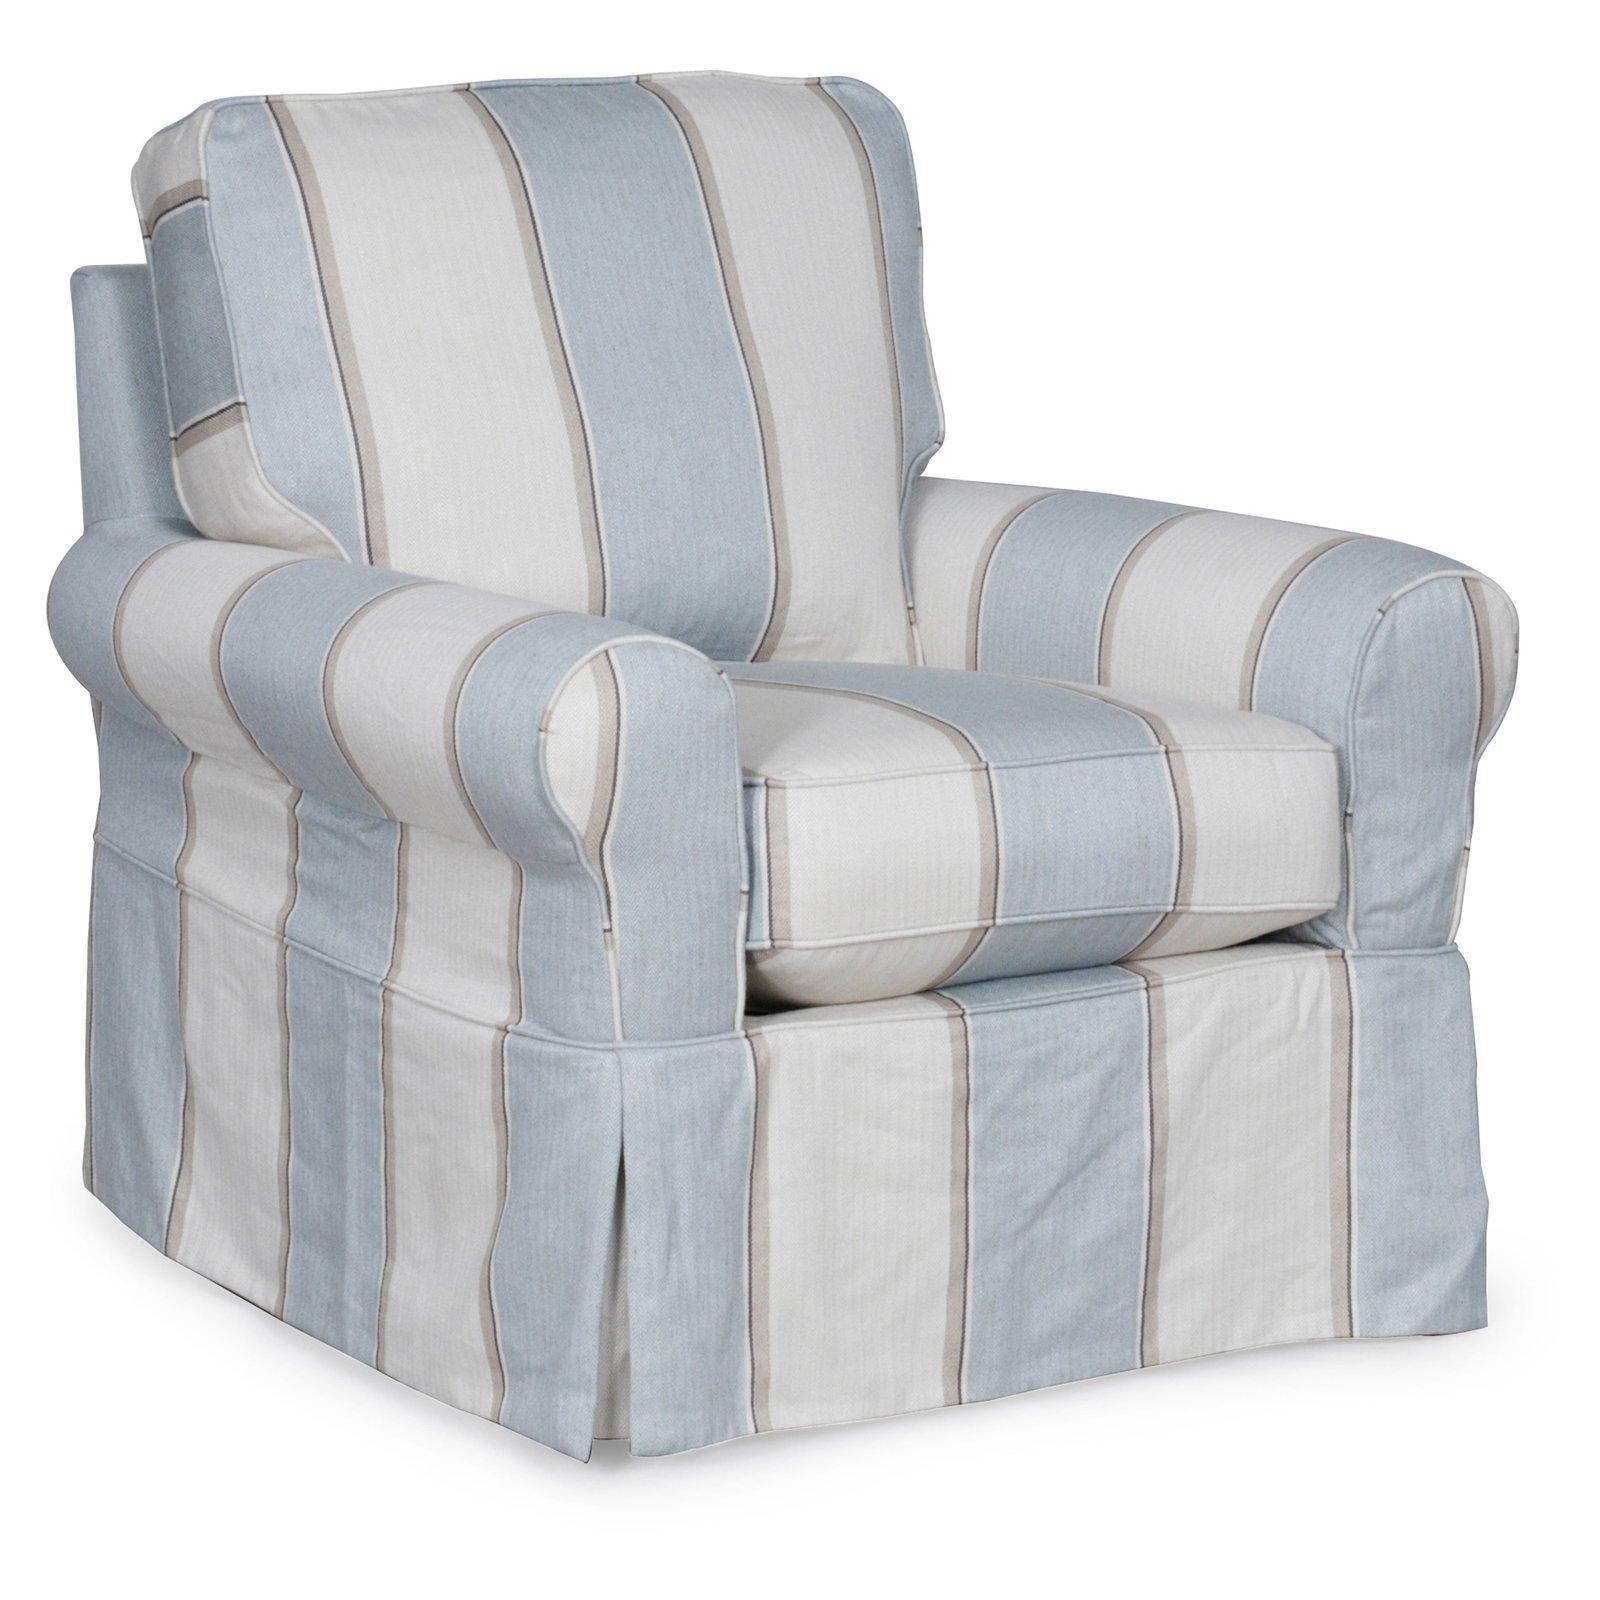 Astounding Sunset Trading Horizon Slipcovered Swivel Chair Indigo Blue Machost Co Dining Chair Design Ideas Machostcouk